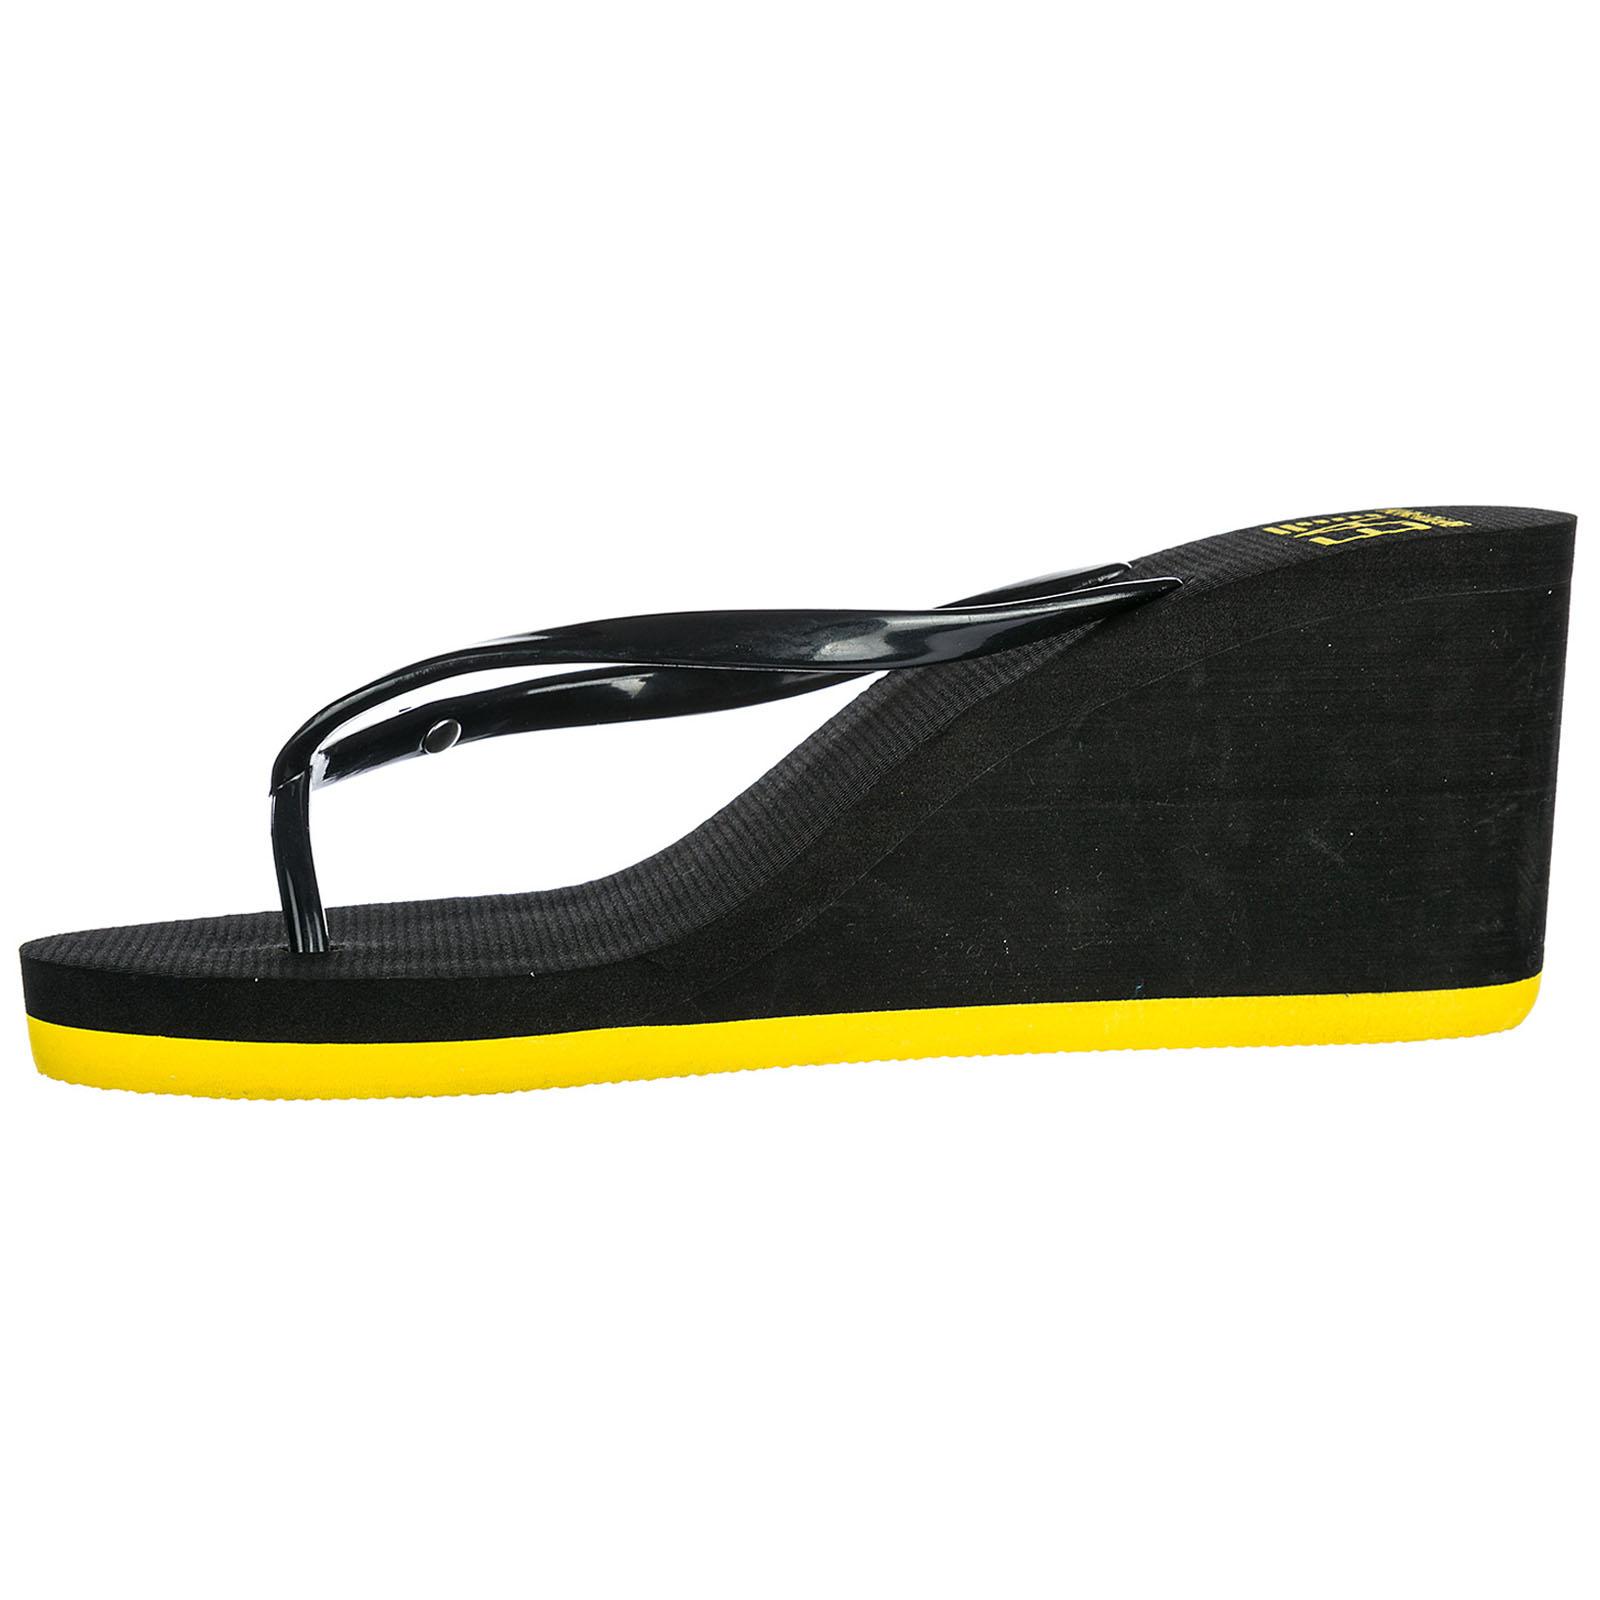 4563b6cf8 Flip flops Emporio Armani EA7 915003 8P295 00020 nero